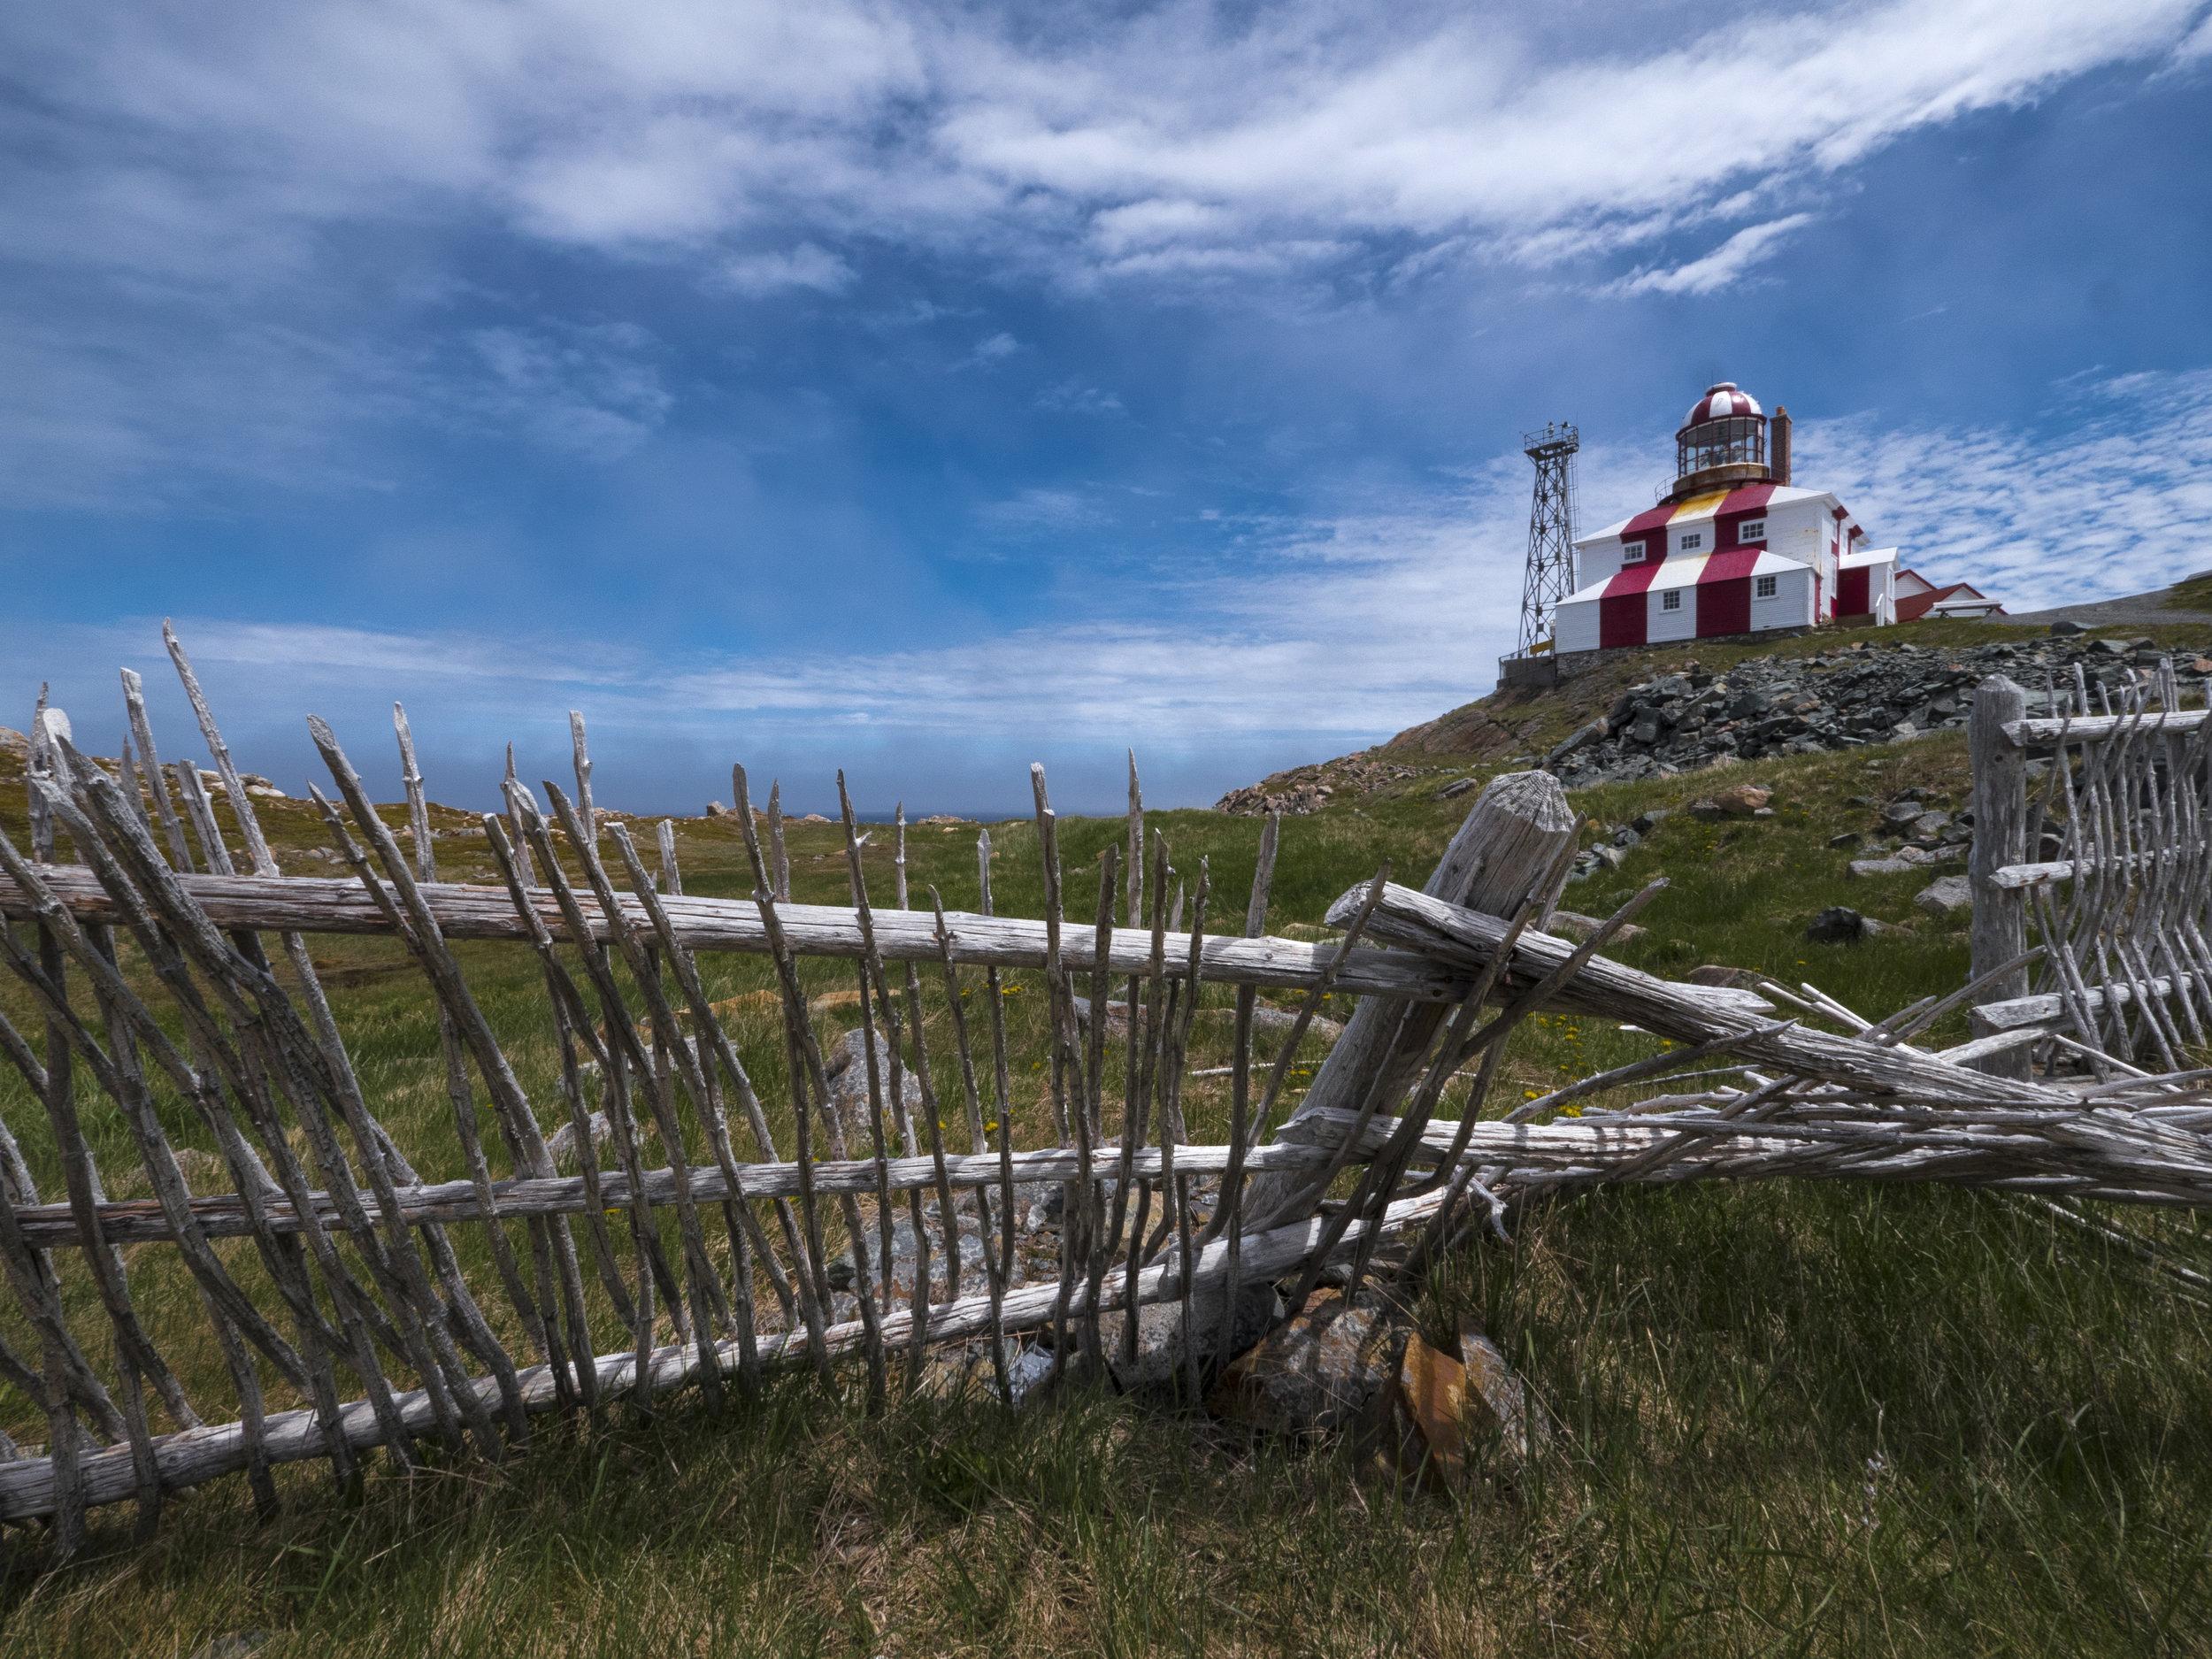 cape bonavista lighthouse 2 - Copy.jpg